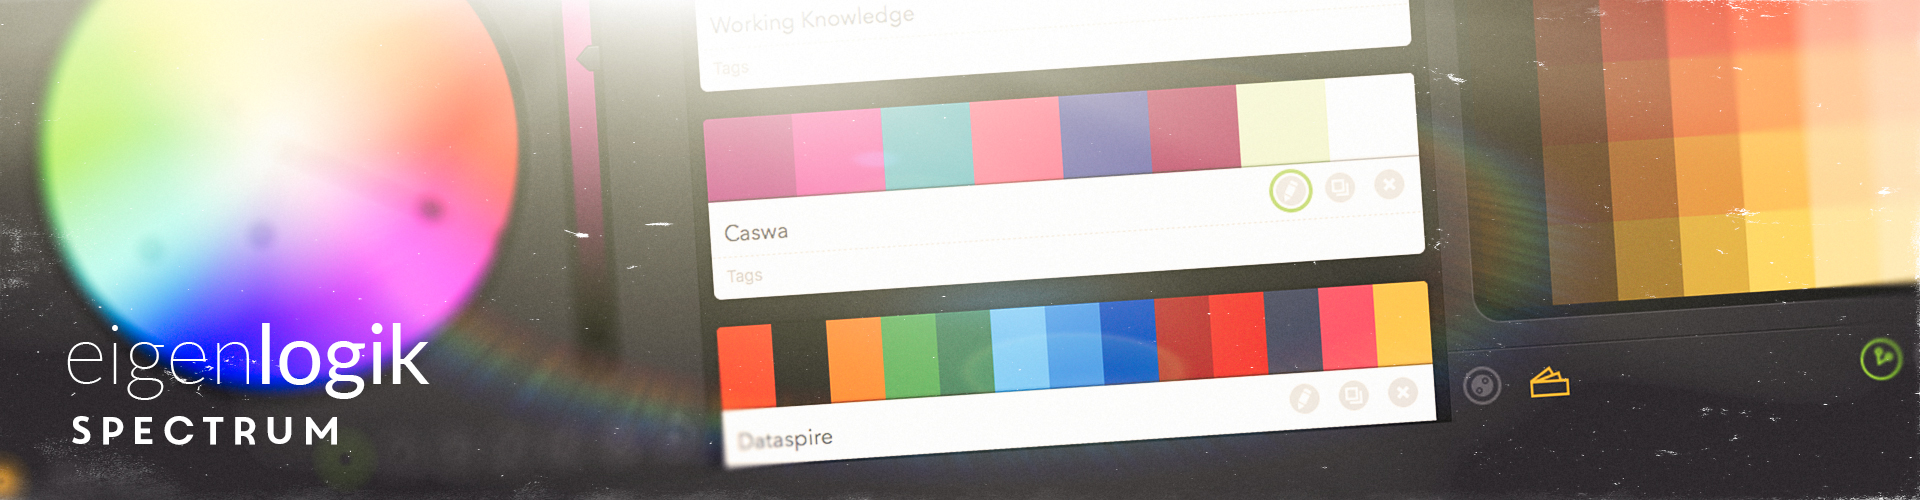 Best Design Apps